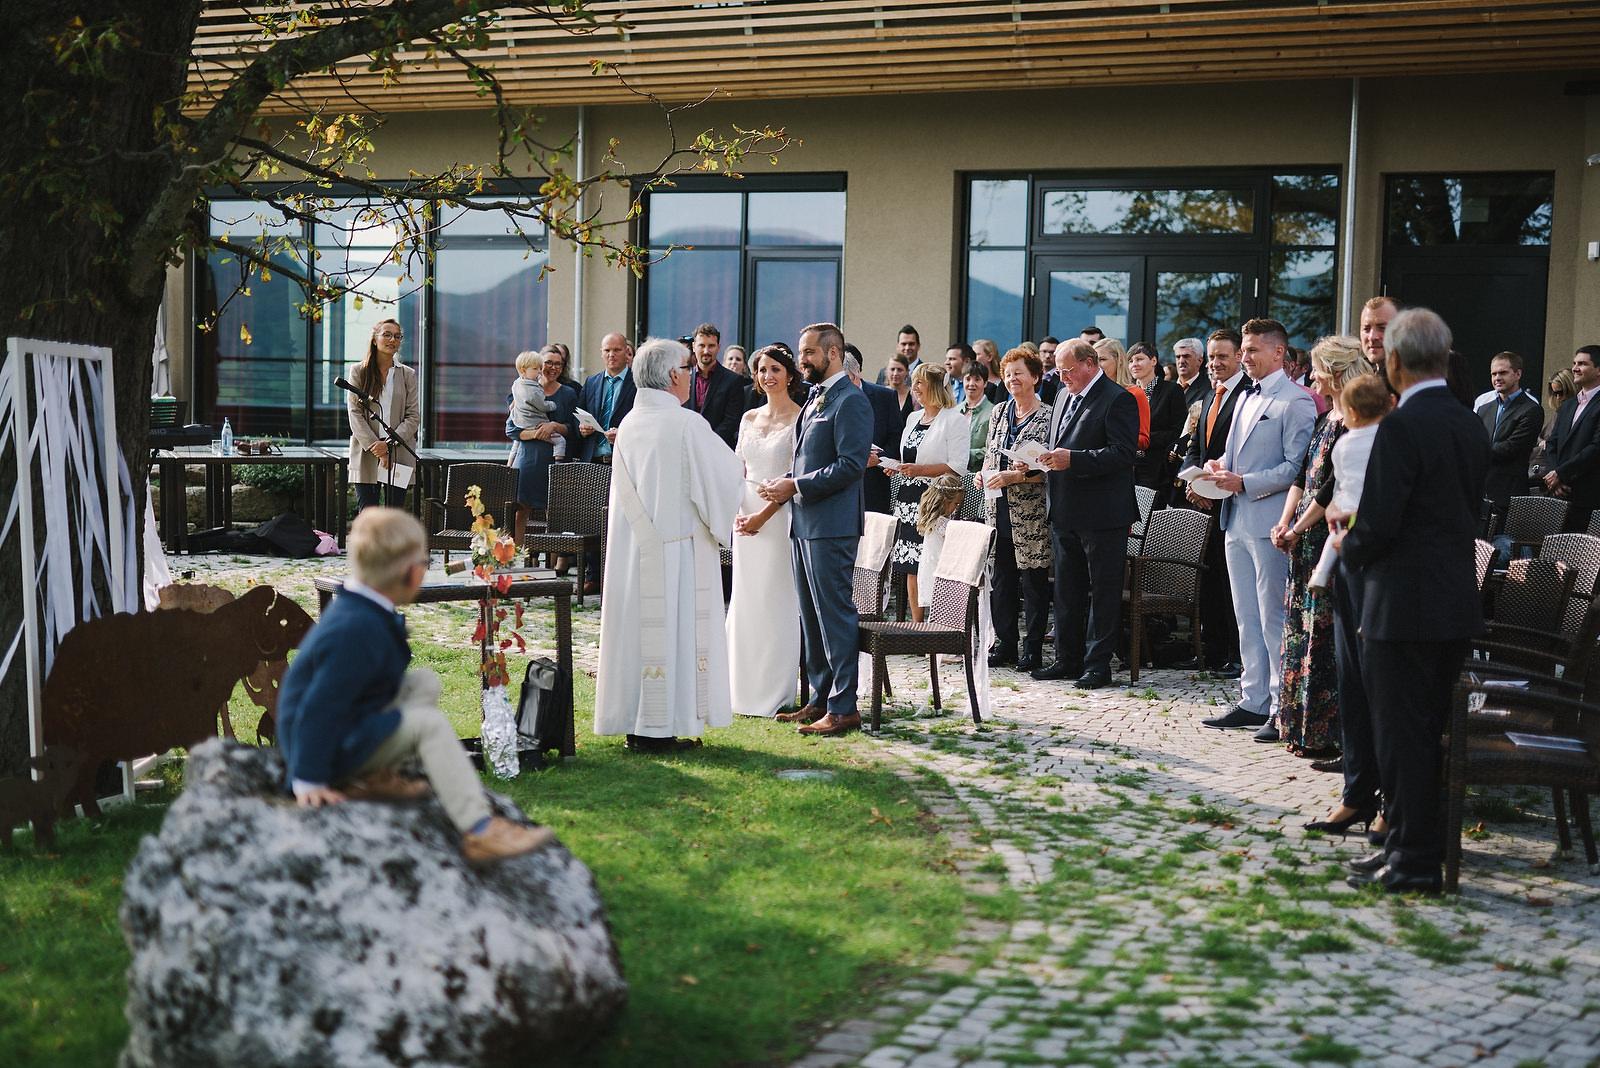 Fotograf Konstanz - Hochzeitsfotograf Reutlingen Achalm Hochzeit EFP 41 - Als Hochzeitsfotograf auf der Achalm, Reutlingen  - 34 -